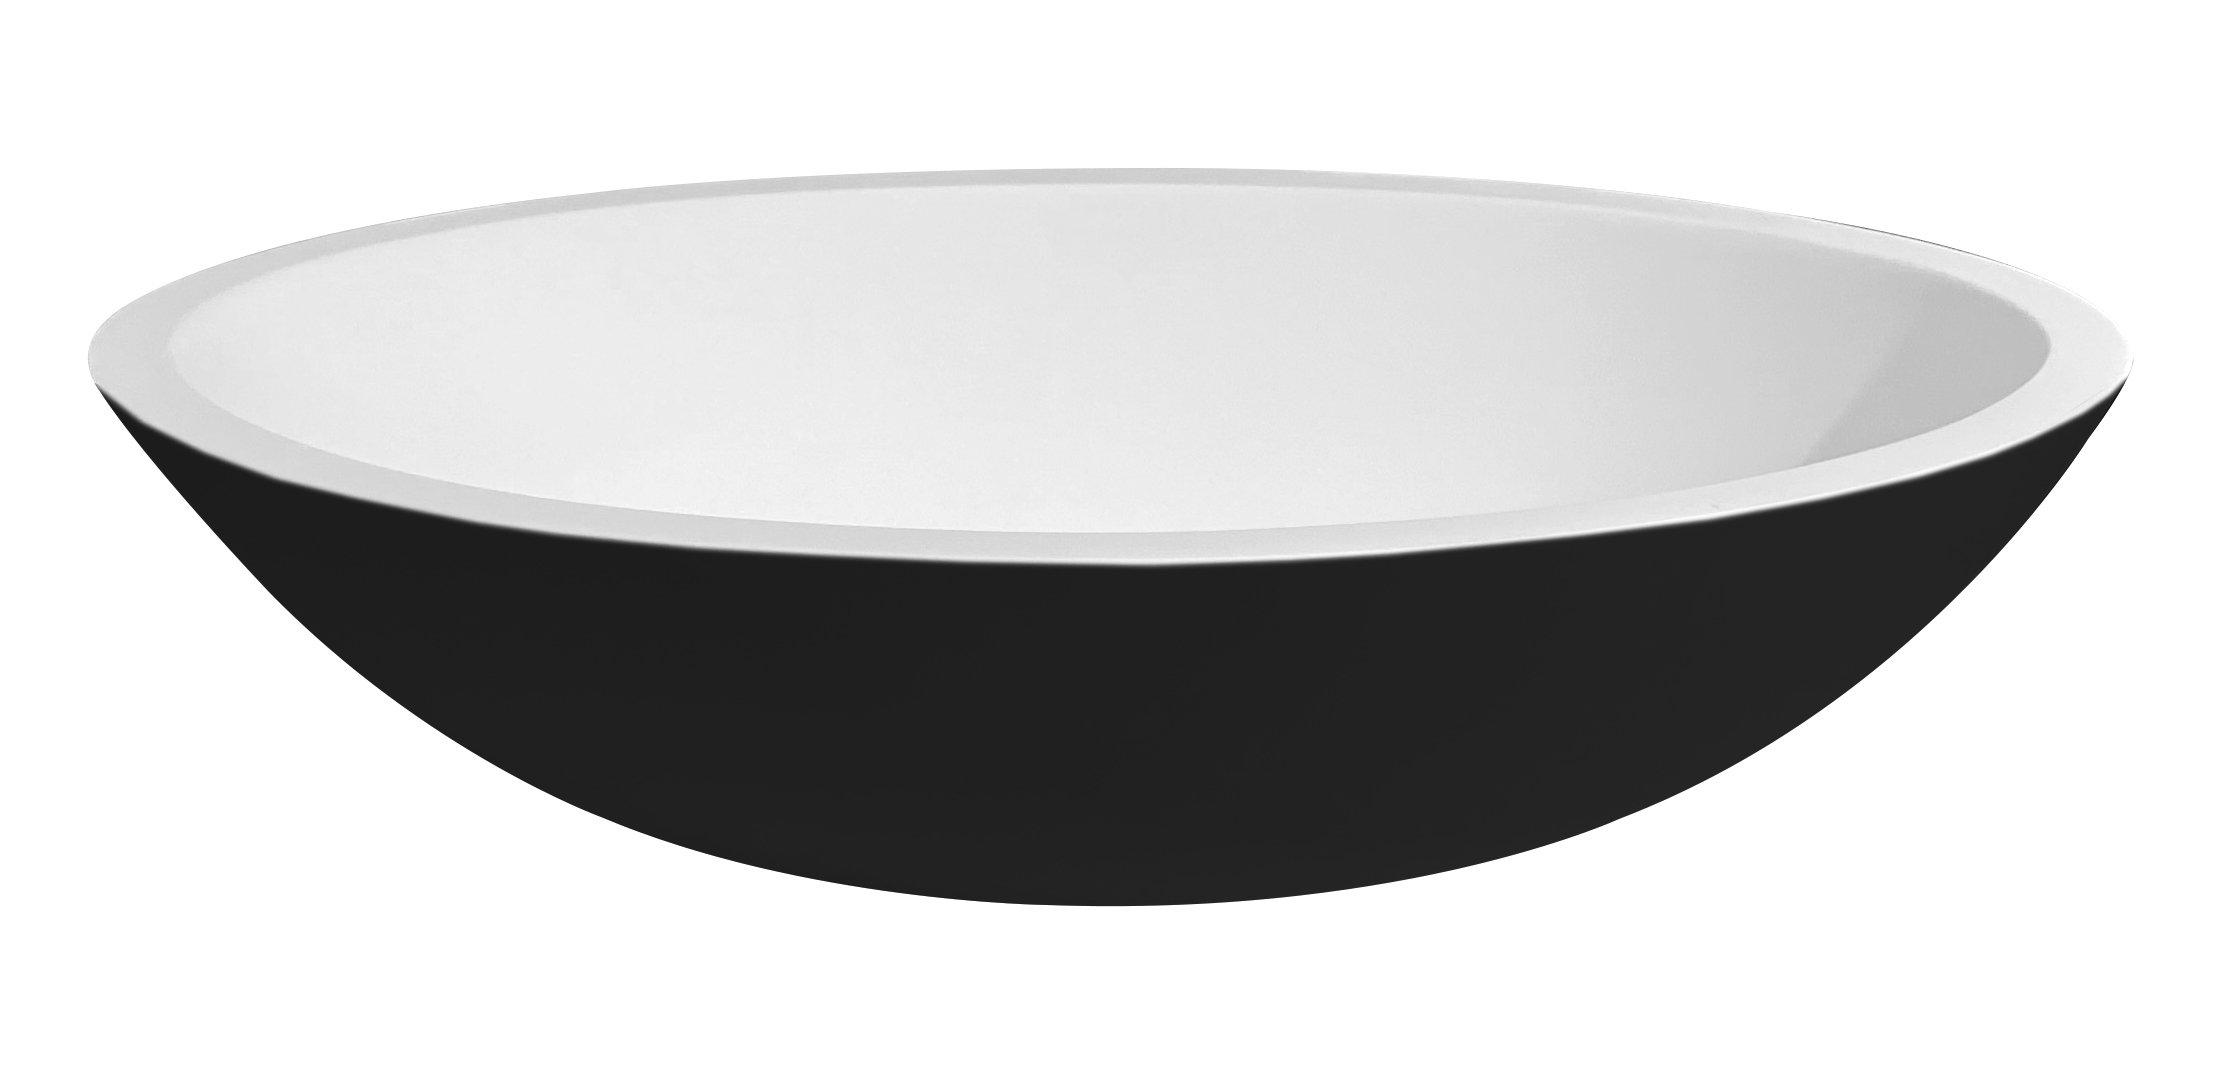 Best Design Epona waskom Just-Solid 52cm bicolor mat zwart/wit